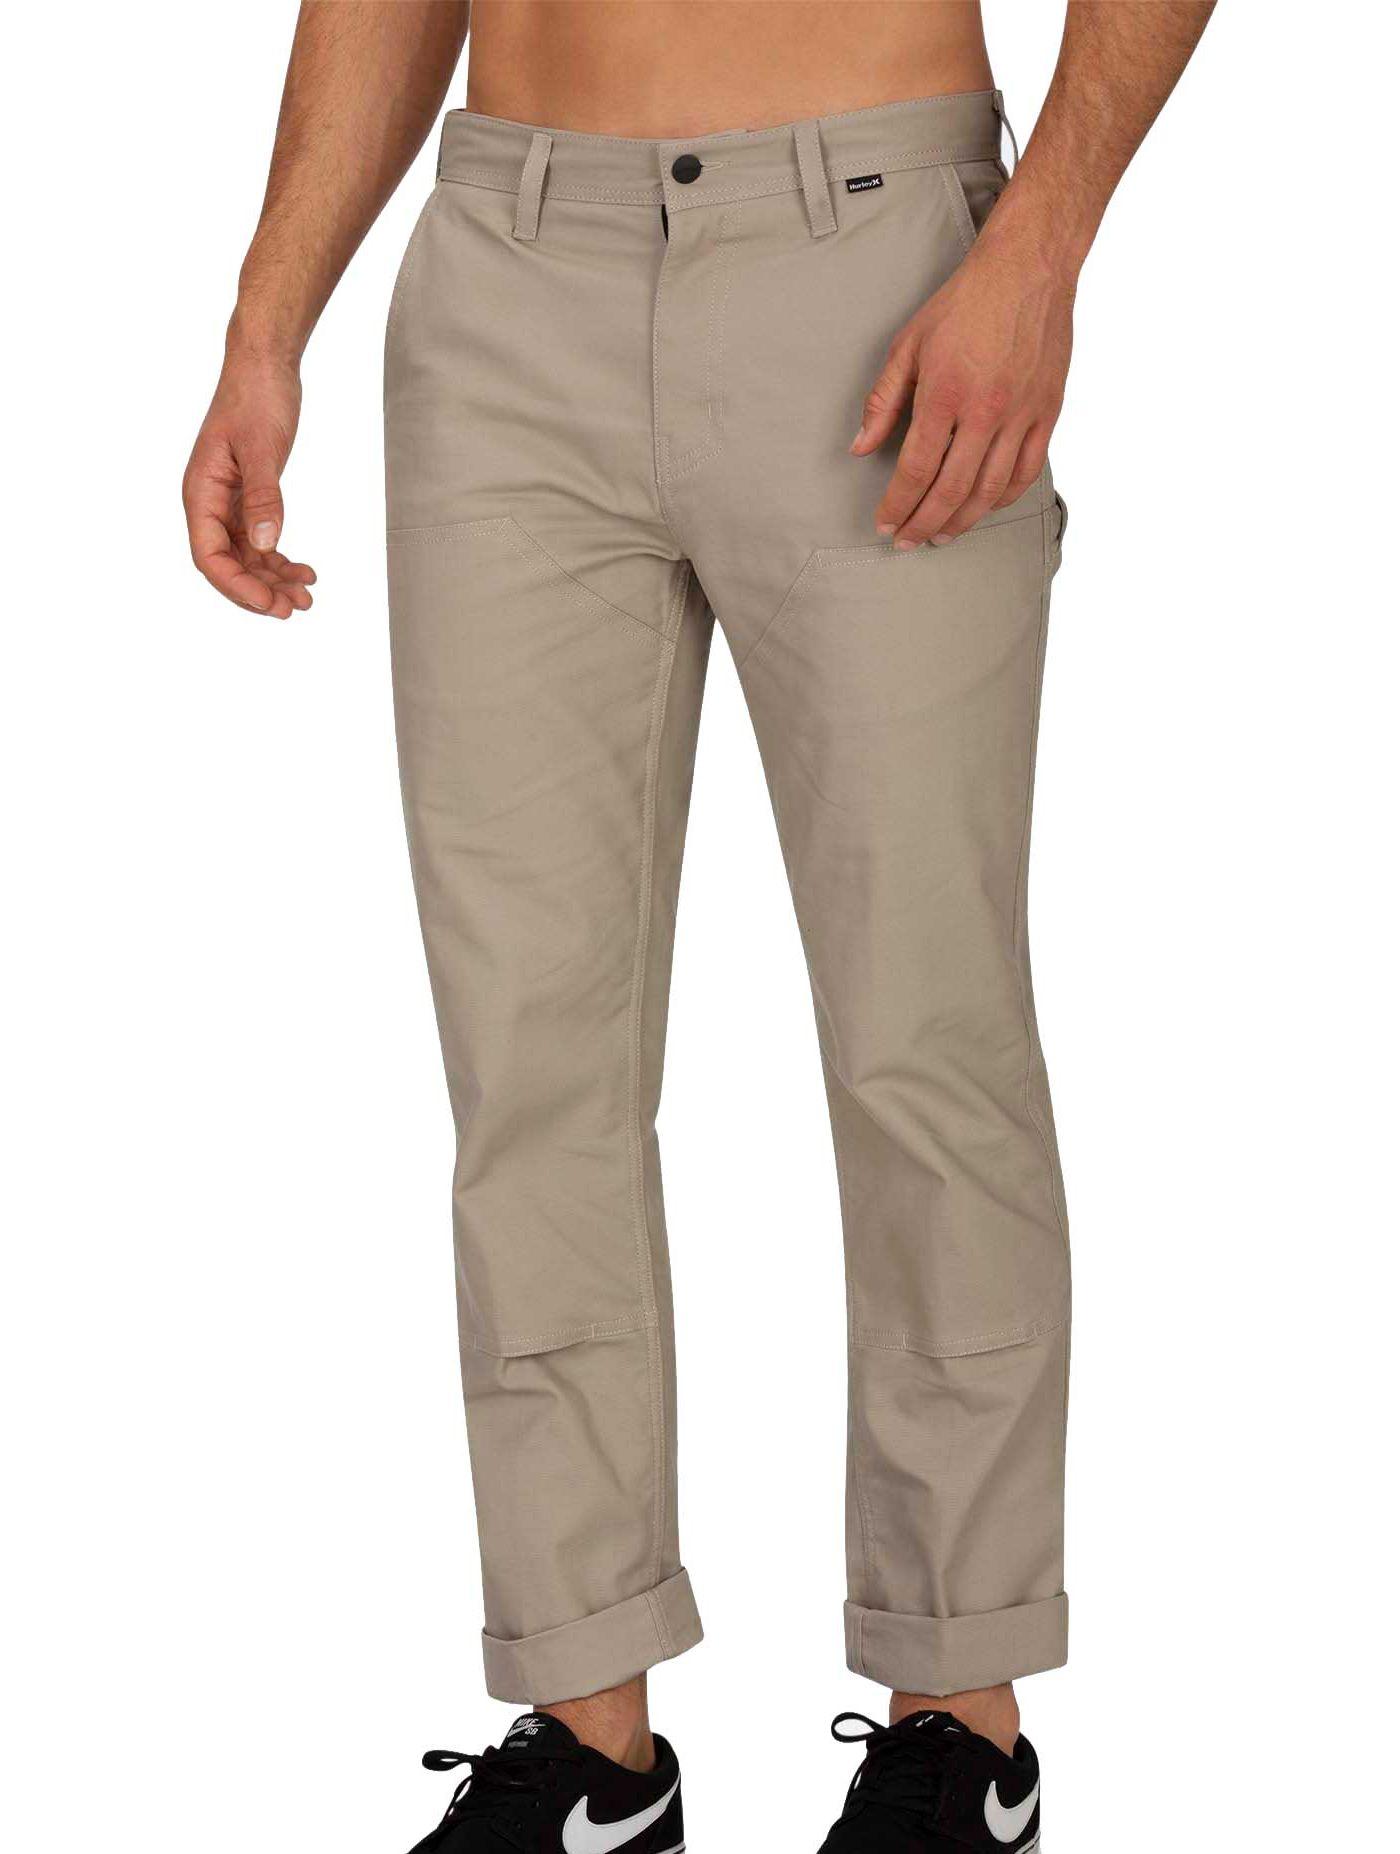 Hurley Men's Carhartt B01 Pants